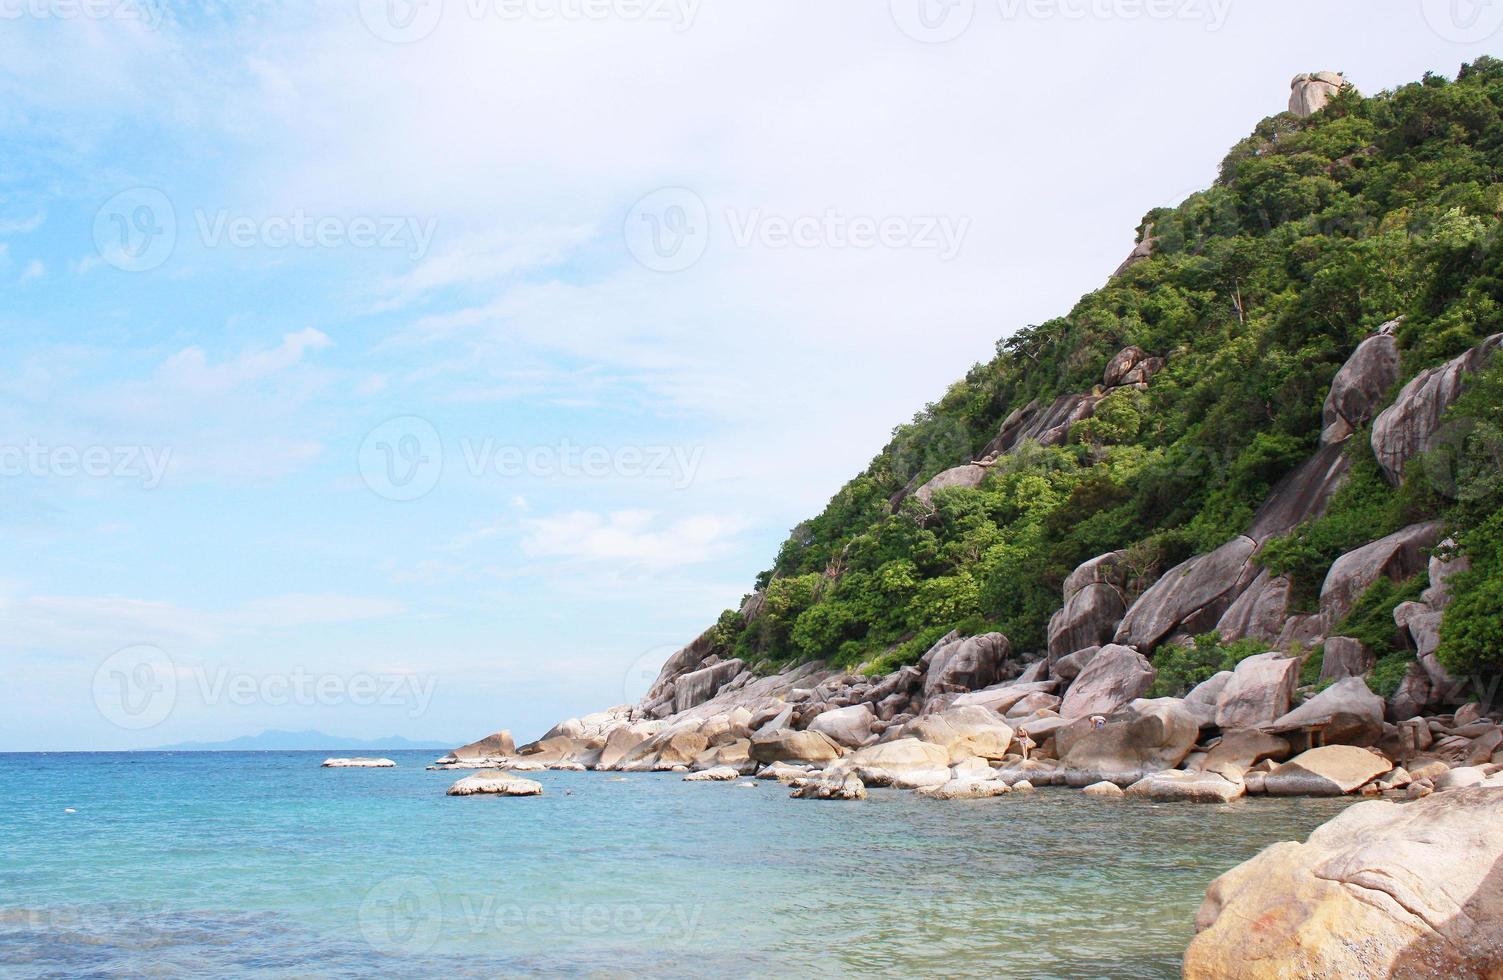 île de tao, koh tao, surat thani thaïlande photo